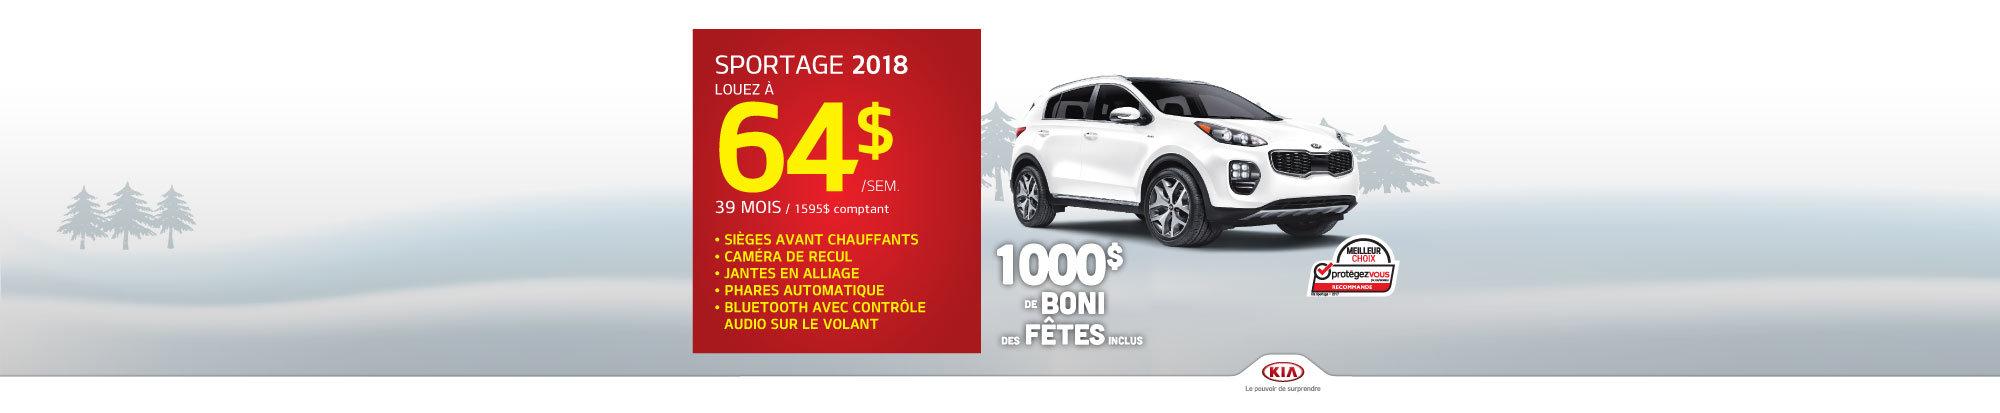 Sportage 2018 web